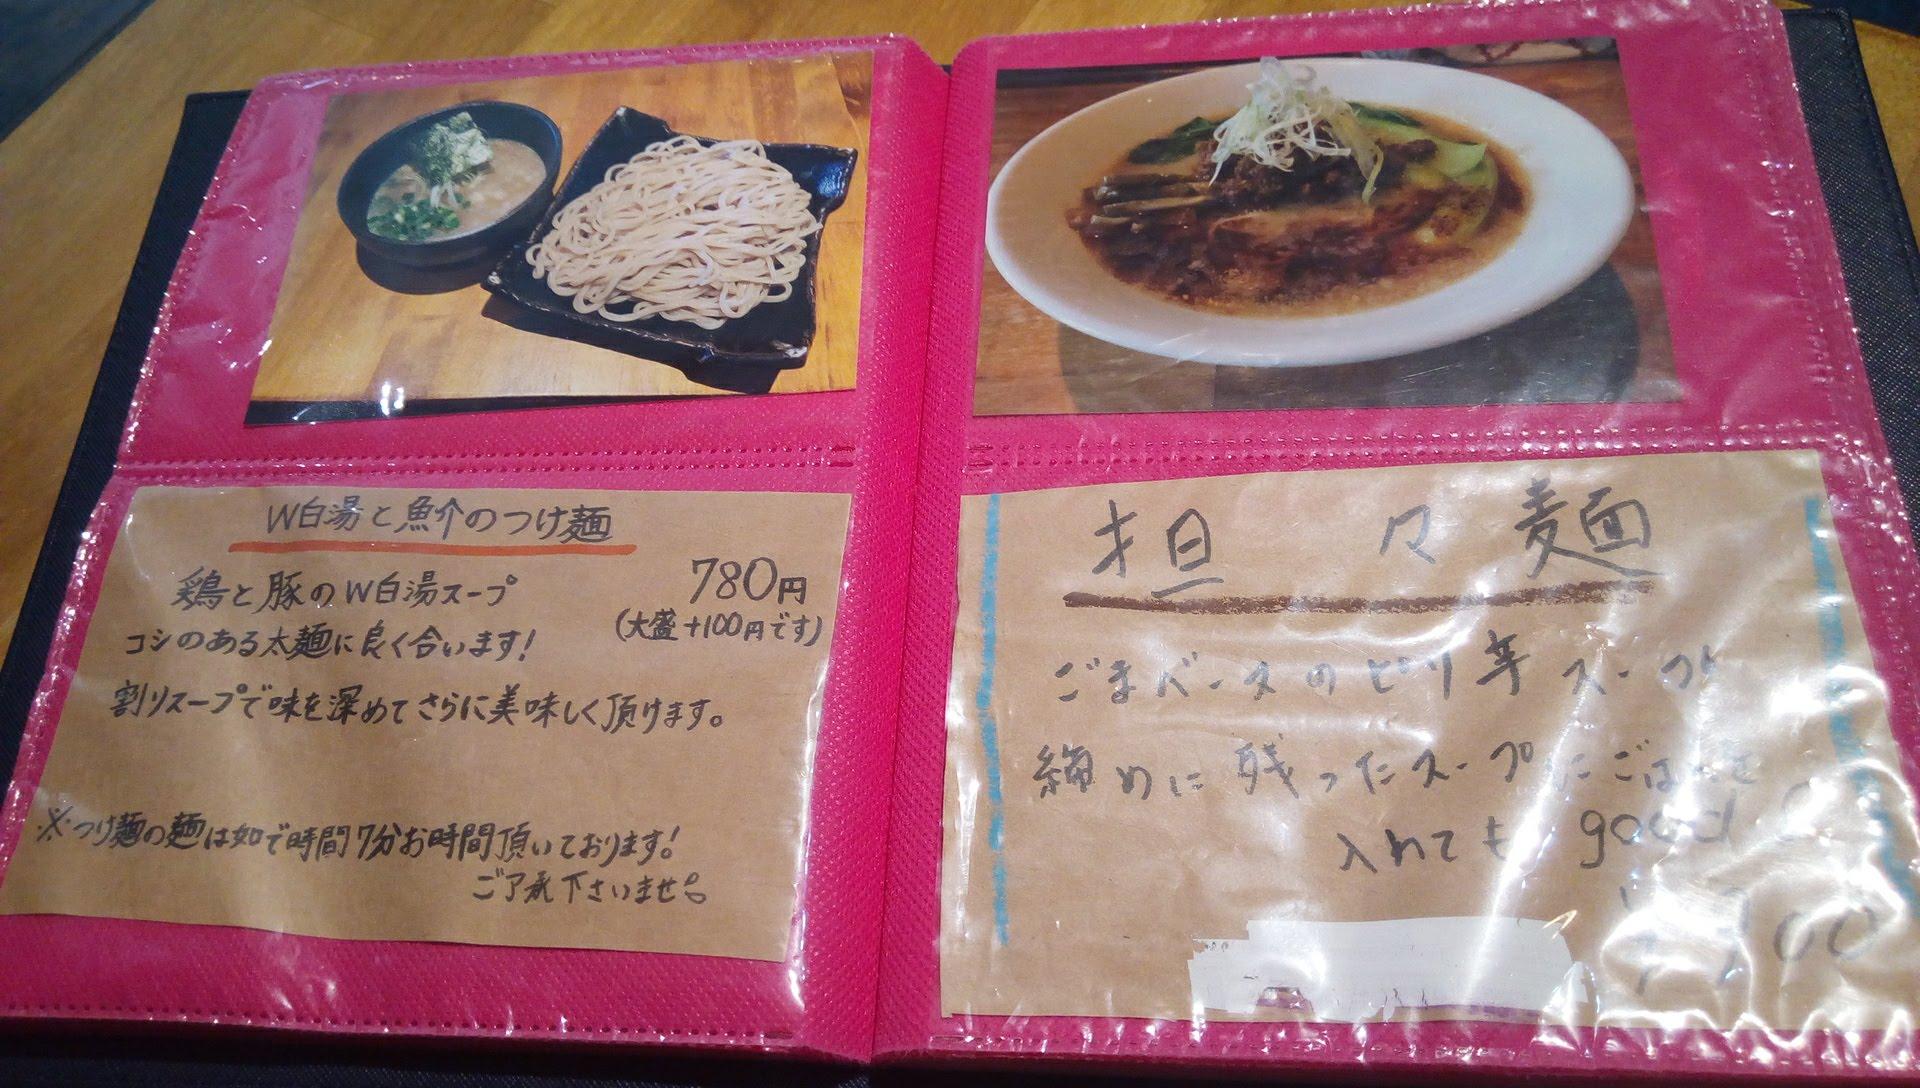 The menu of Menya-Gochi 4